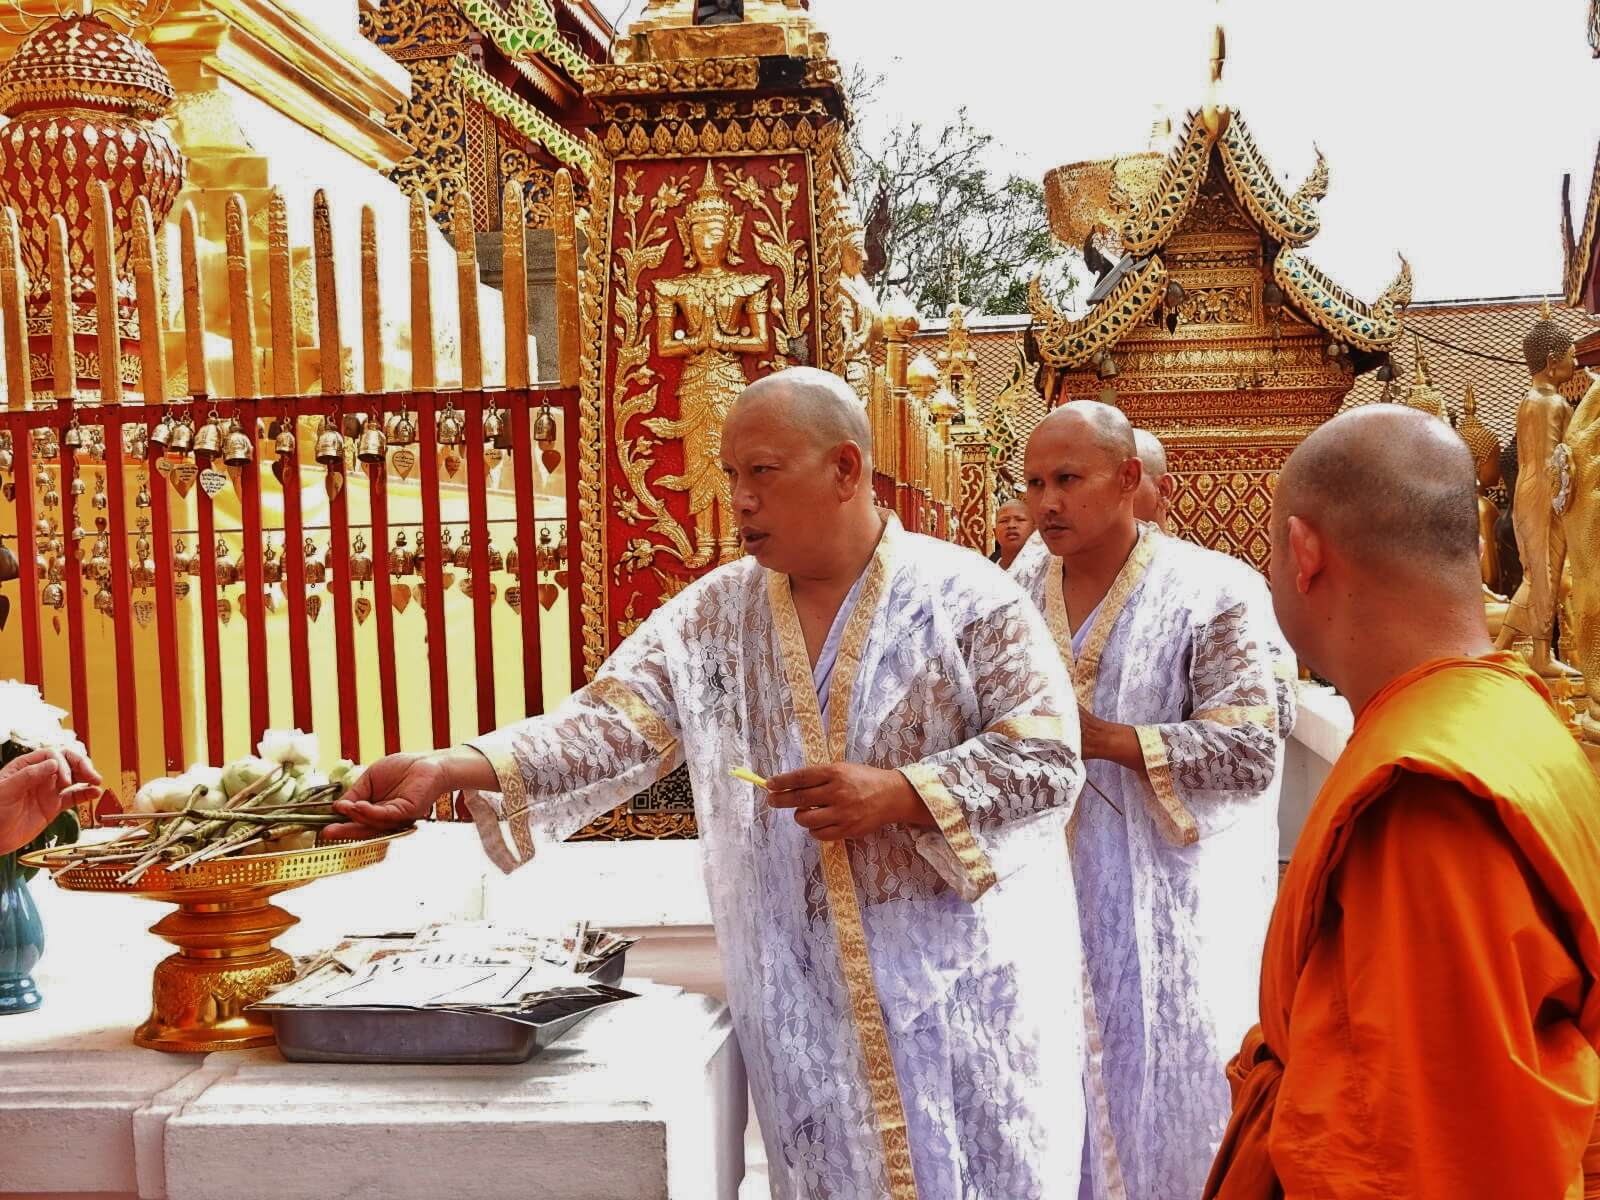 Таиланд, праздник Вишакха Буча, город Чиангмай, храм Дой Сутхеп.